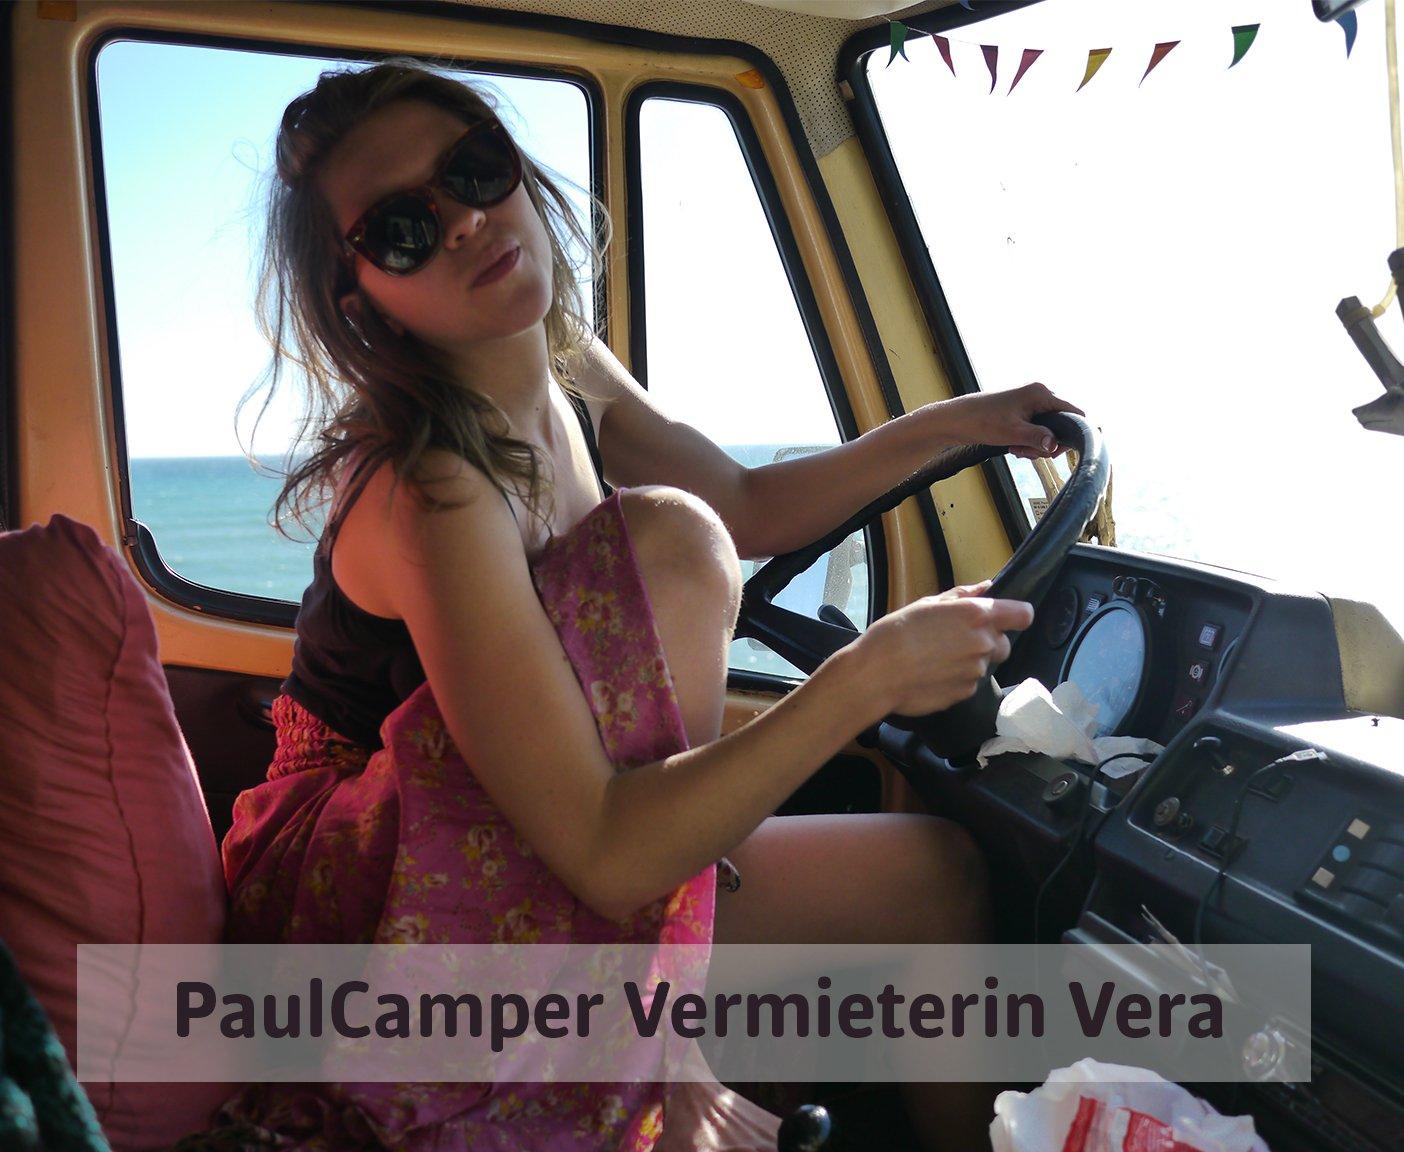 Frau am Lenkrad, PaulCamper Vermieterin Vera